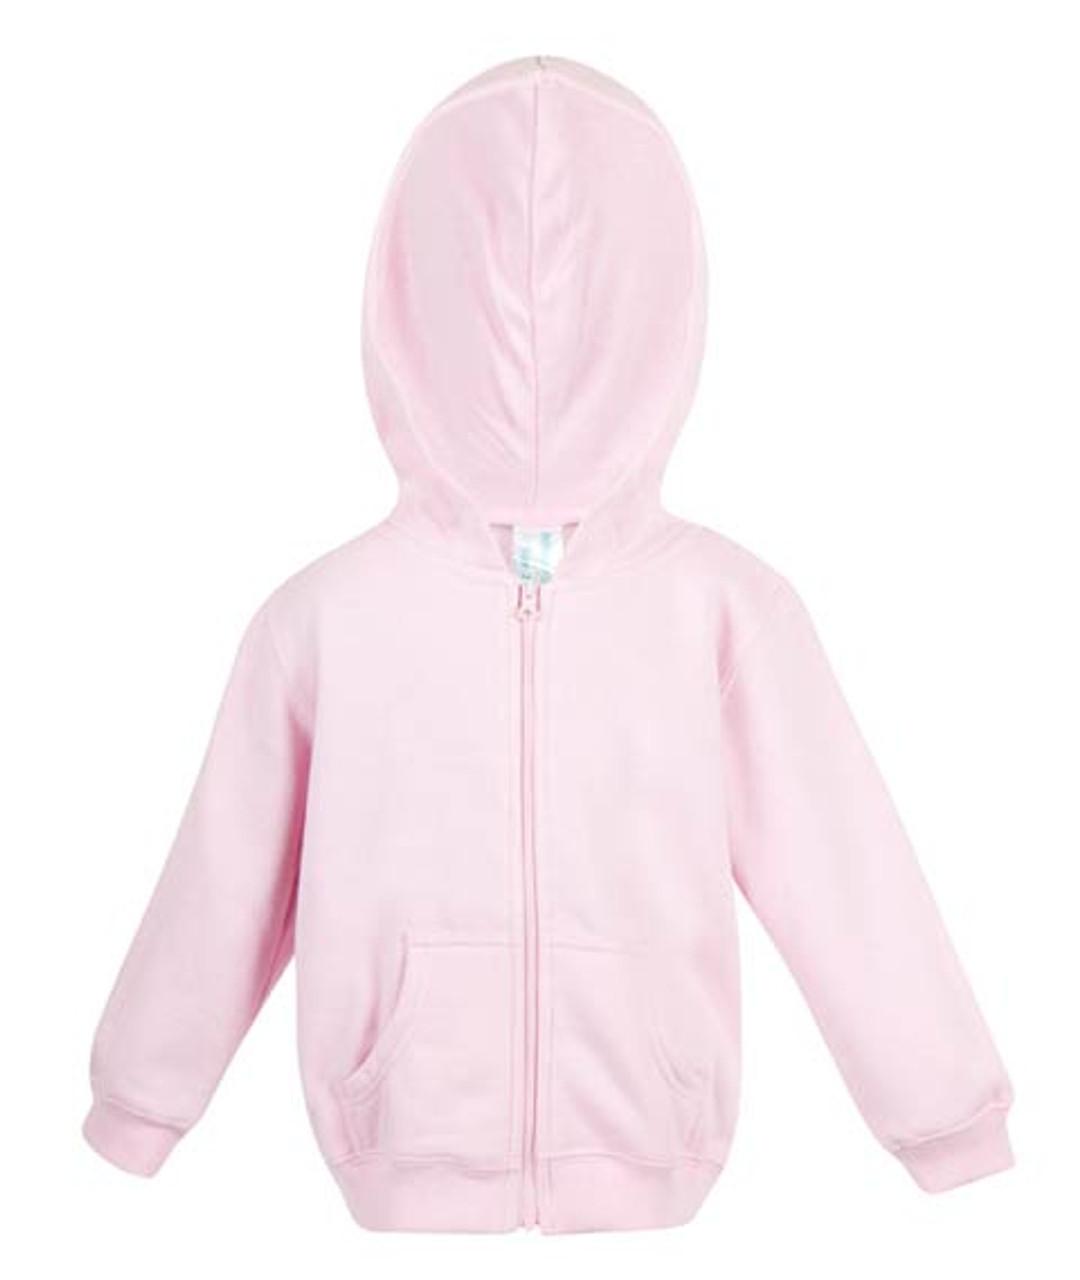 Aiden Baby Zip Hoodies Plain Blank Clothing Australia